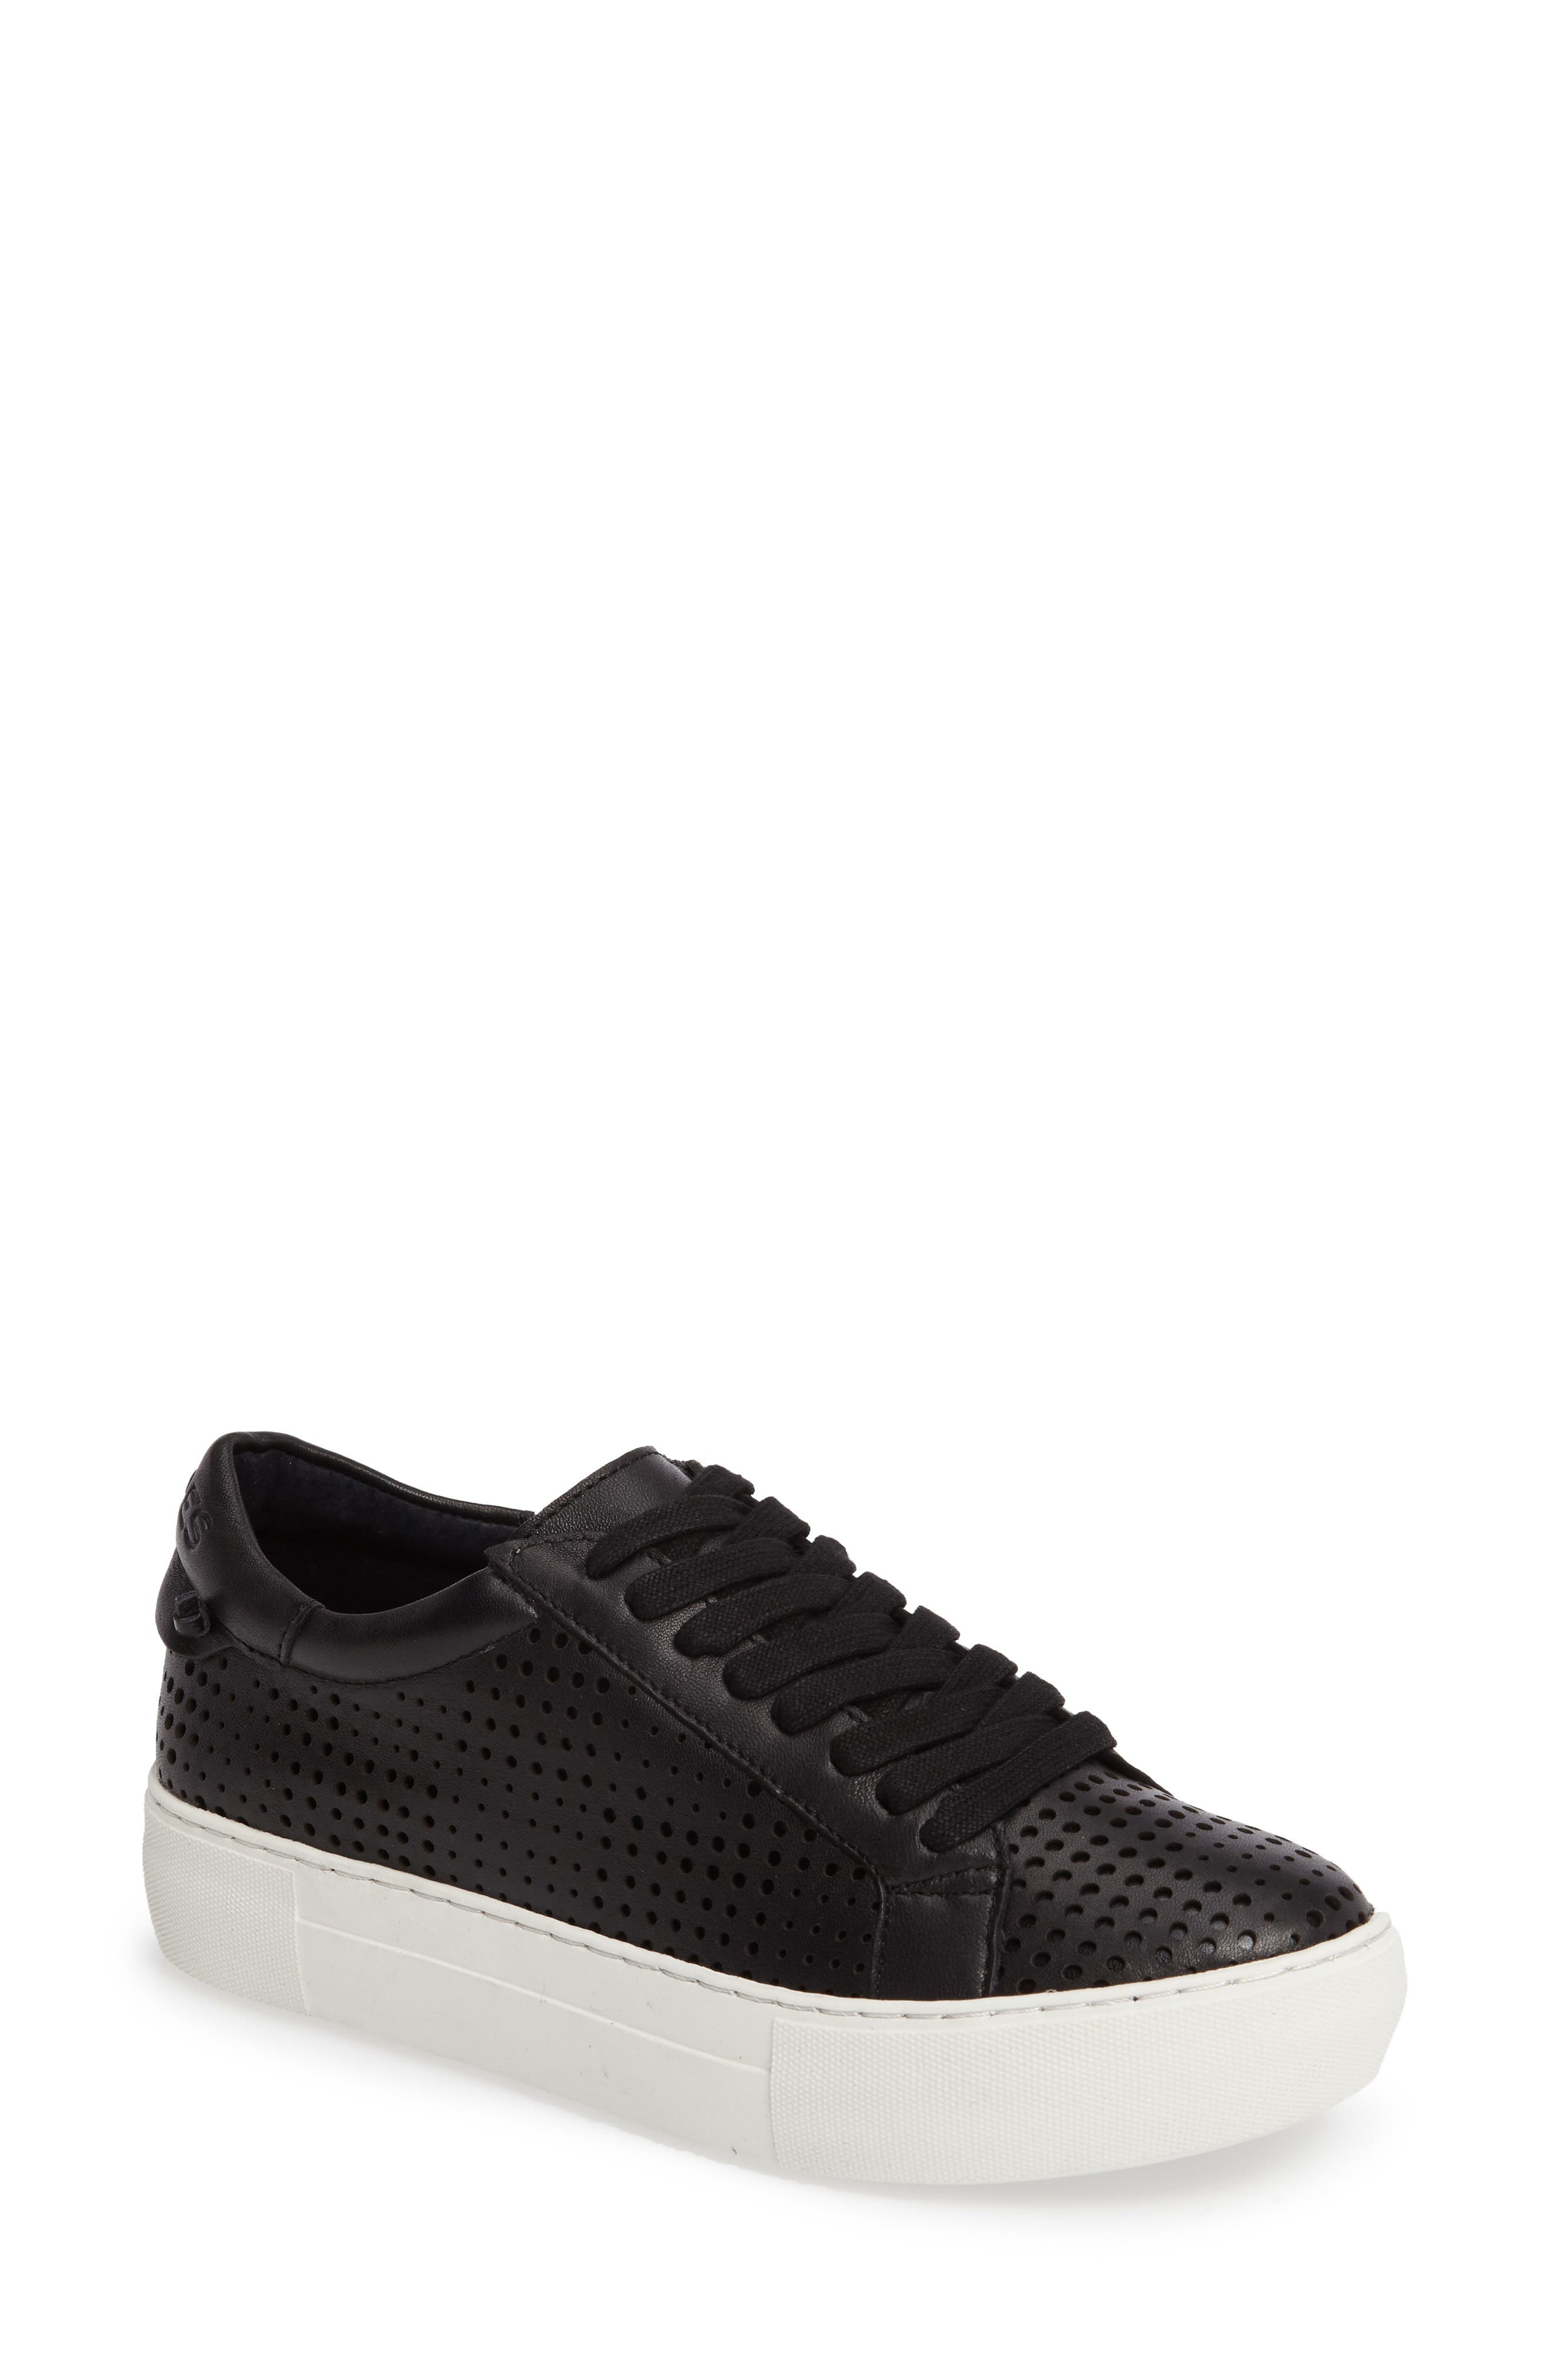 Audrina Platform Sneaker,                         Main,                         color, Black Leather